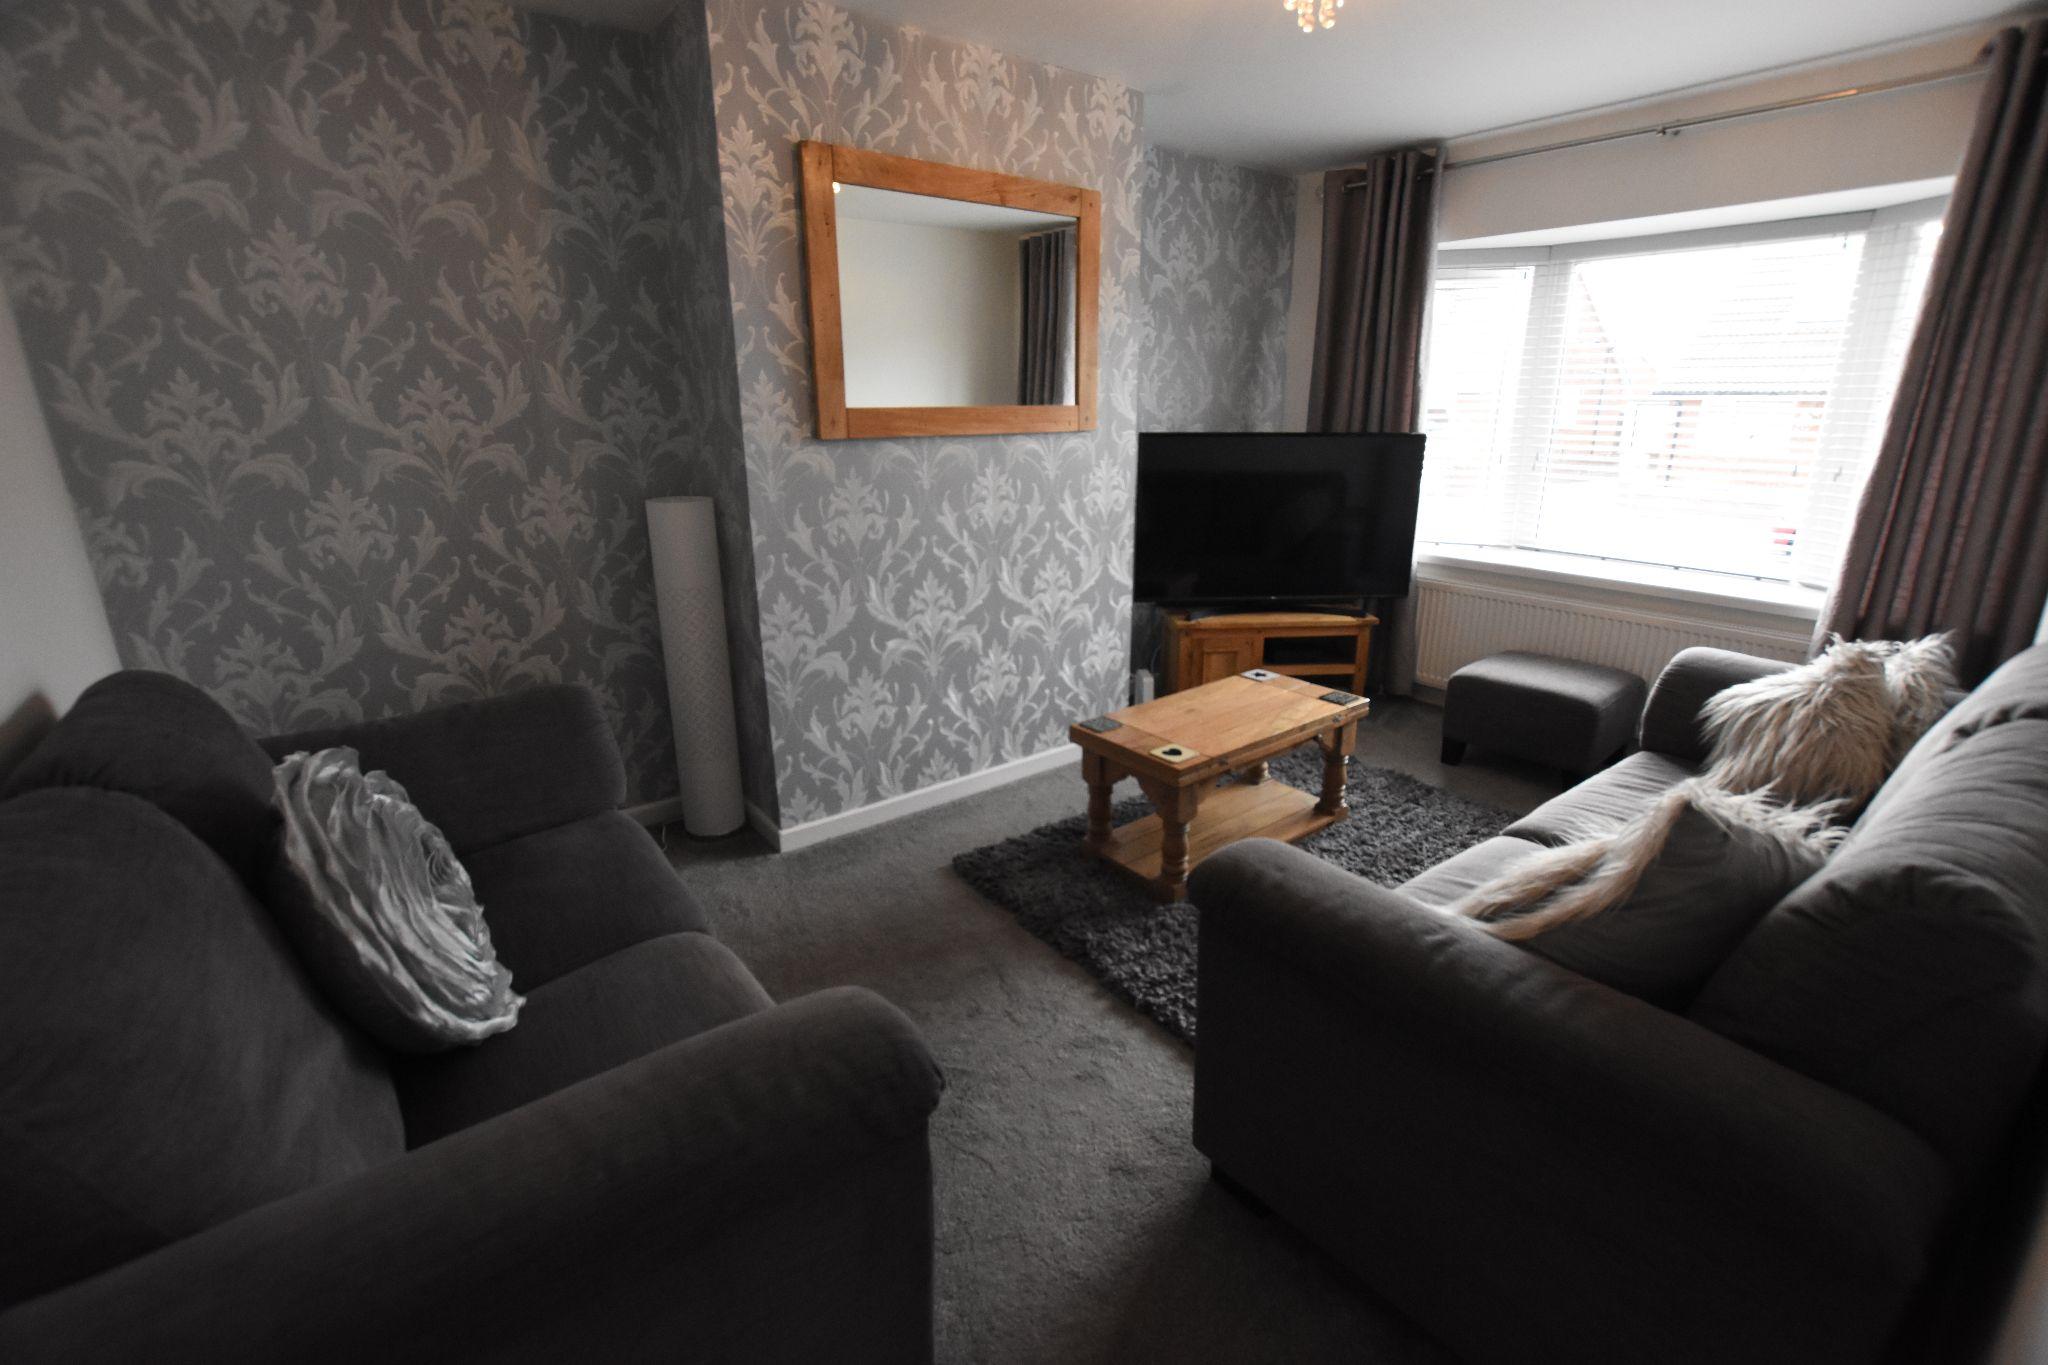 4 bedroom semi-detached bungalow Sold STC in Preston - Lounge